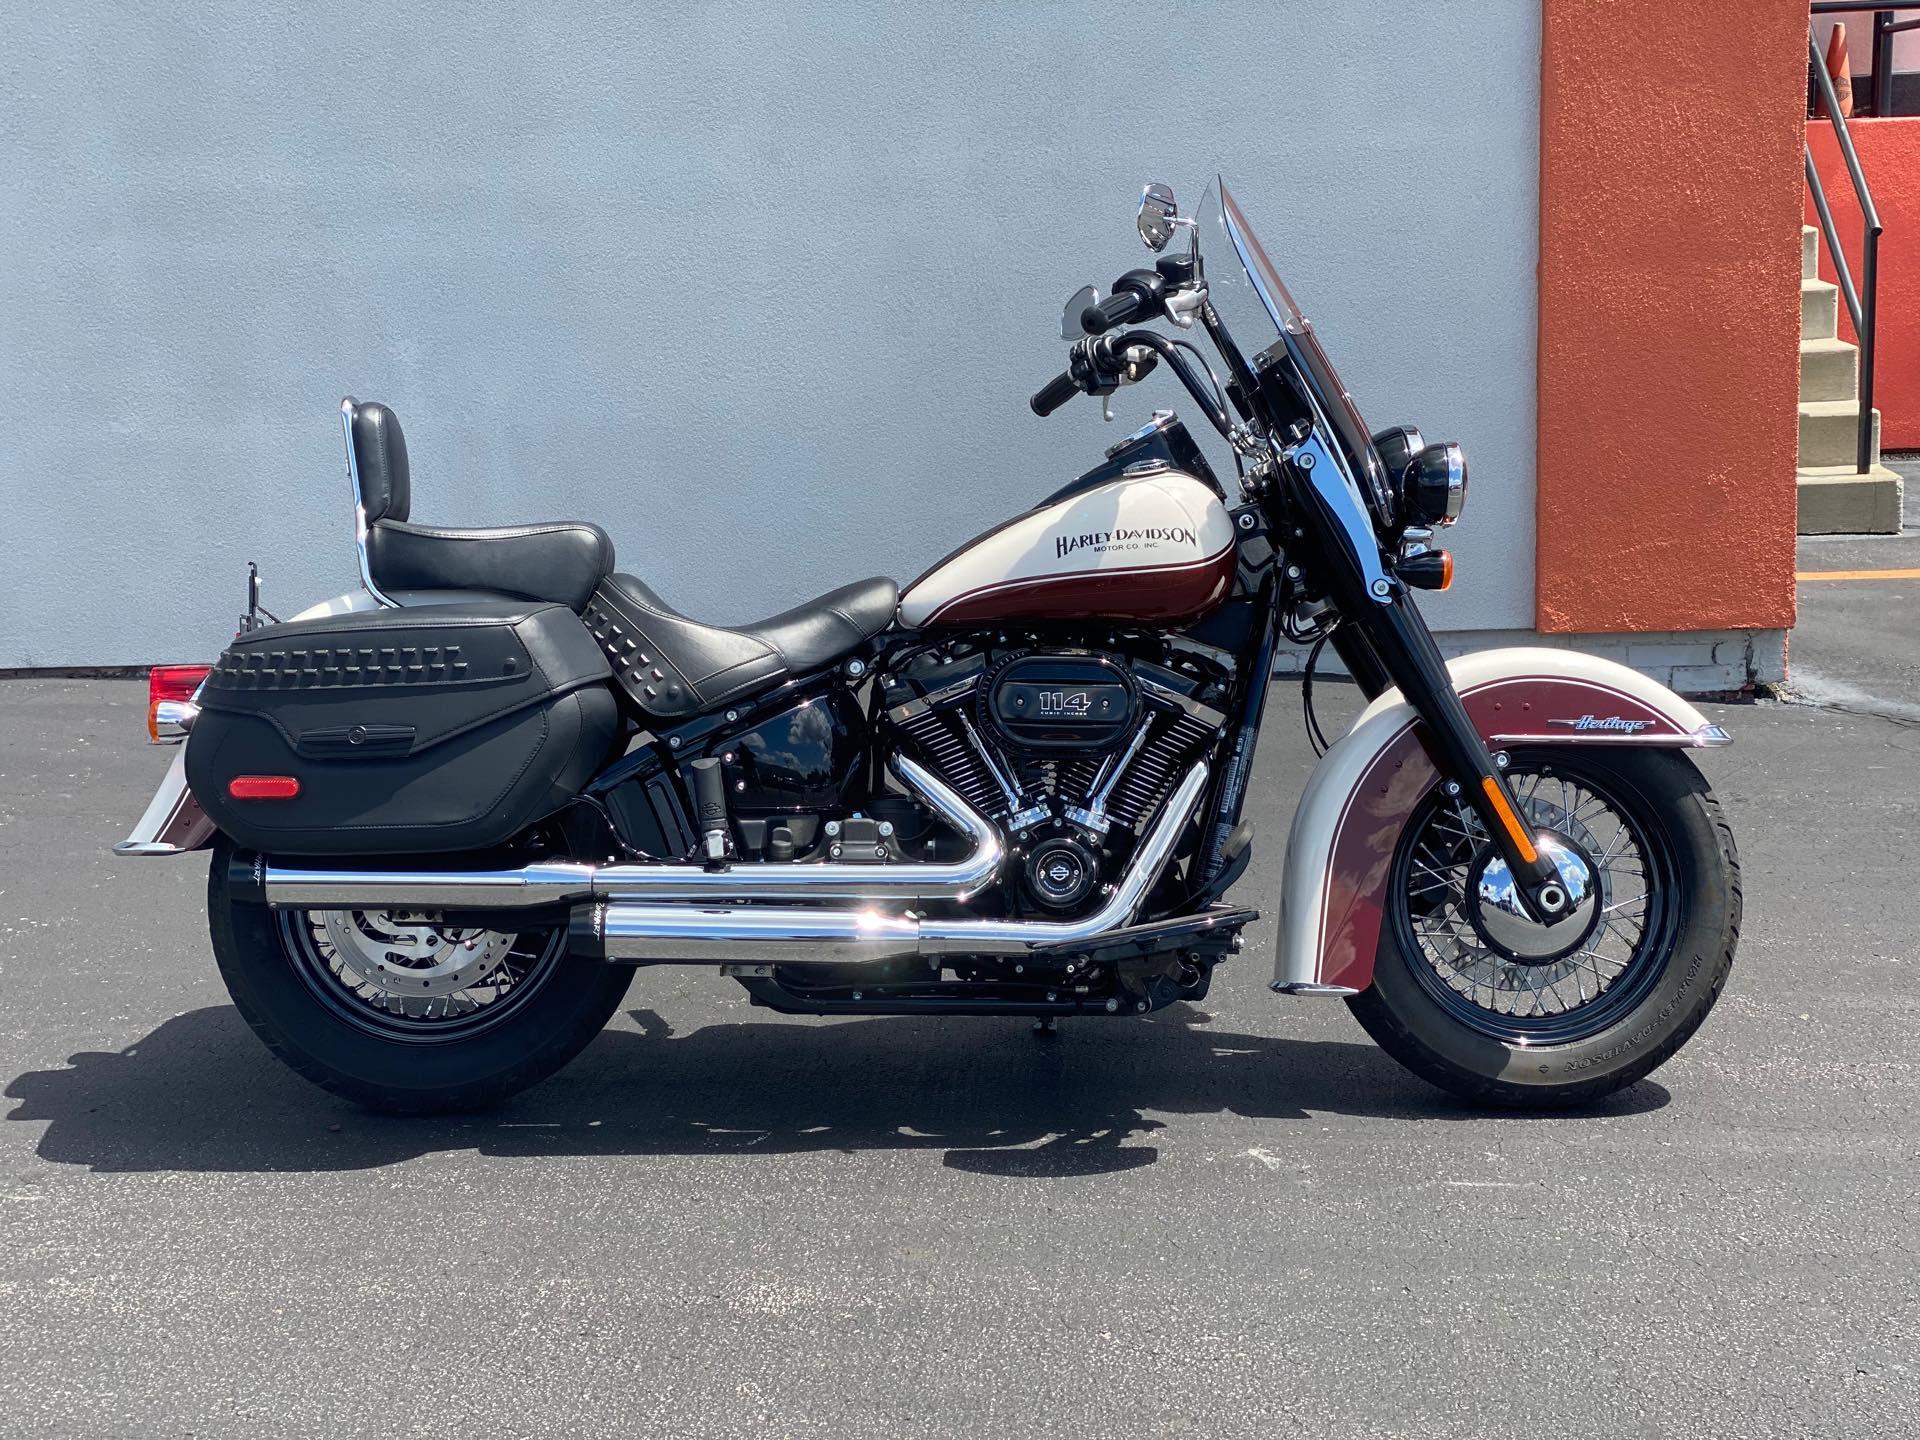 2018 Harley-Davidson Softail Heritage Classic 114 at Thunder Harley-Davidson